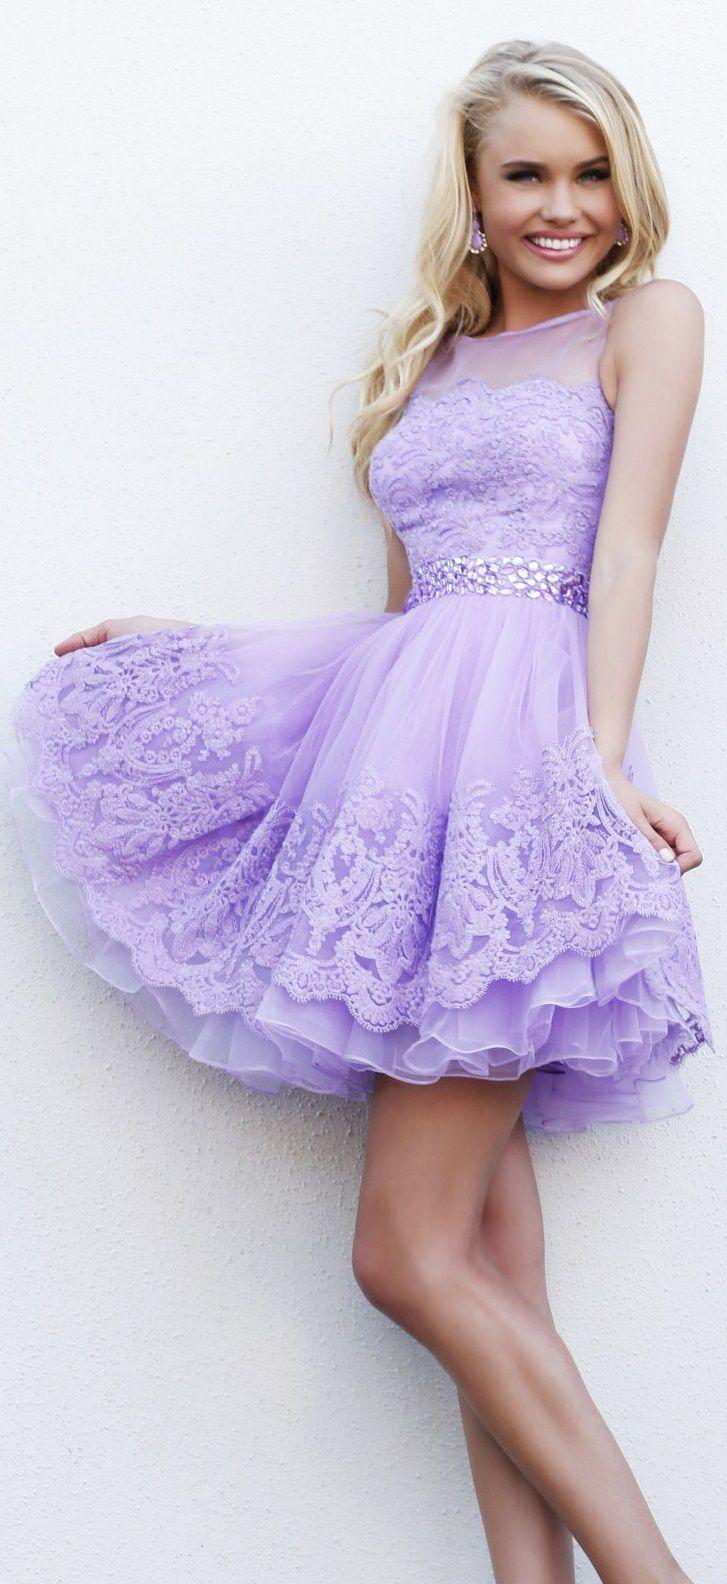 32 best Bridesmaid Dresses images on Pinterest | Bridesmaid, Brides ...